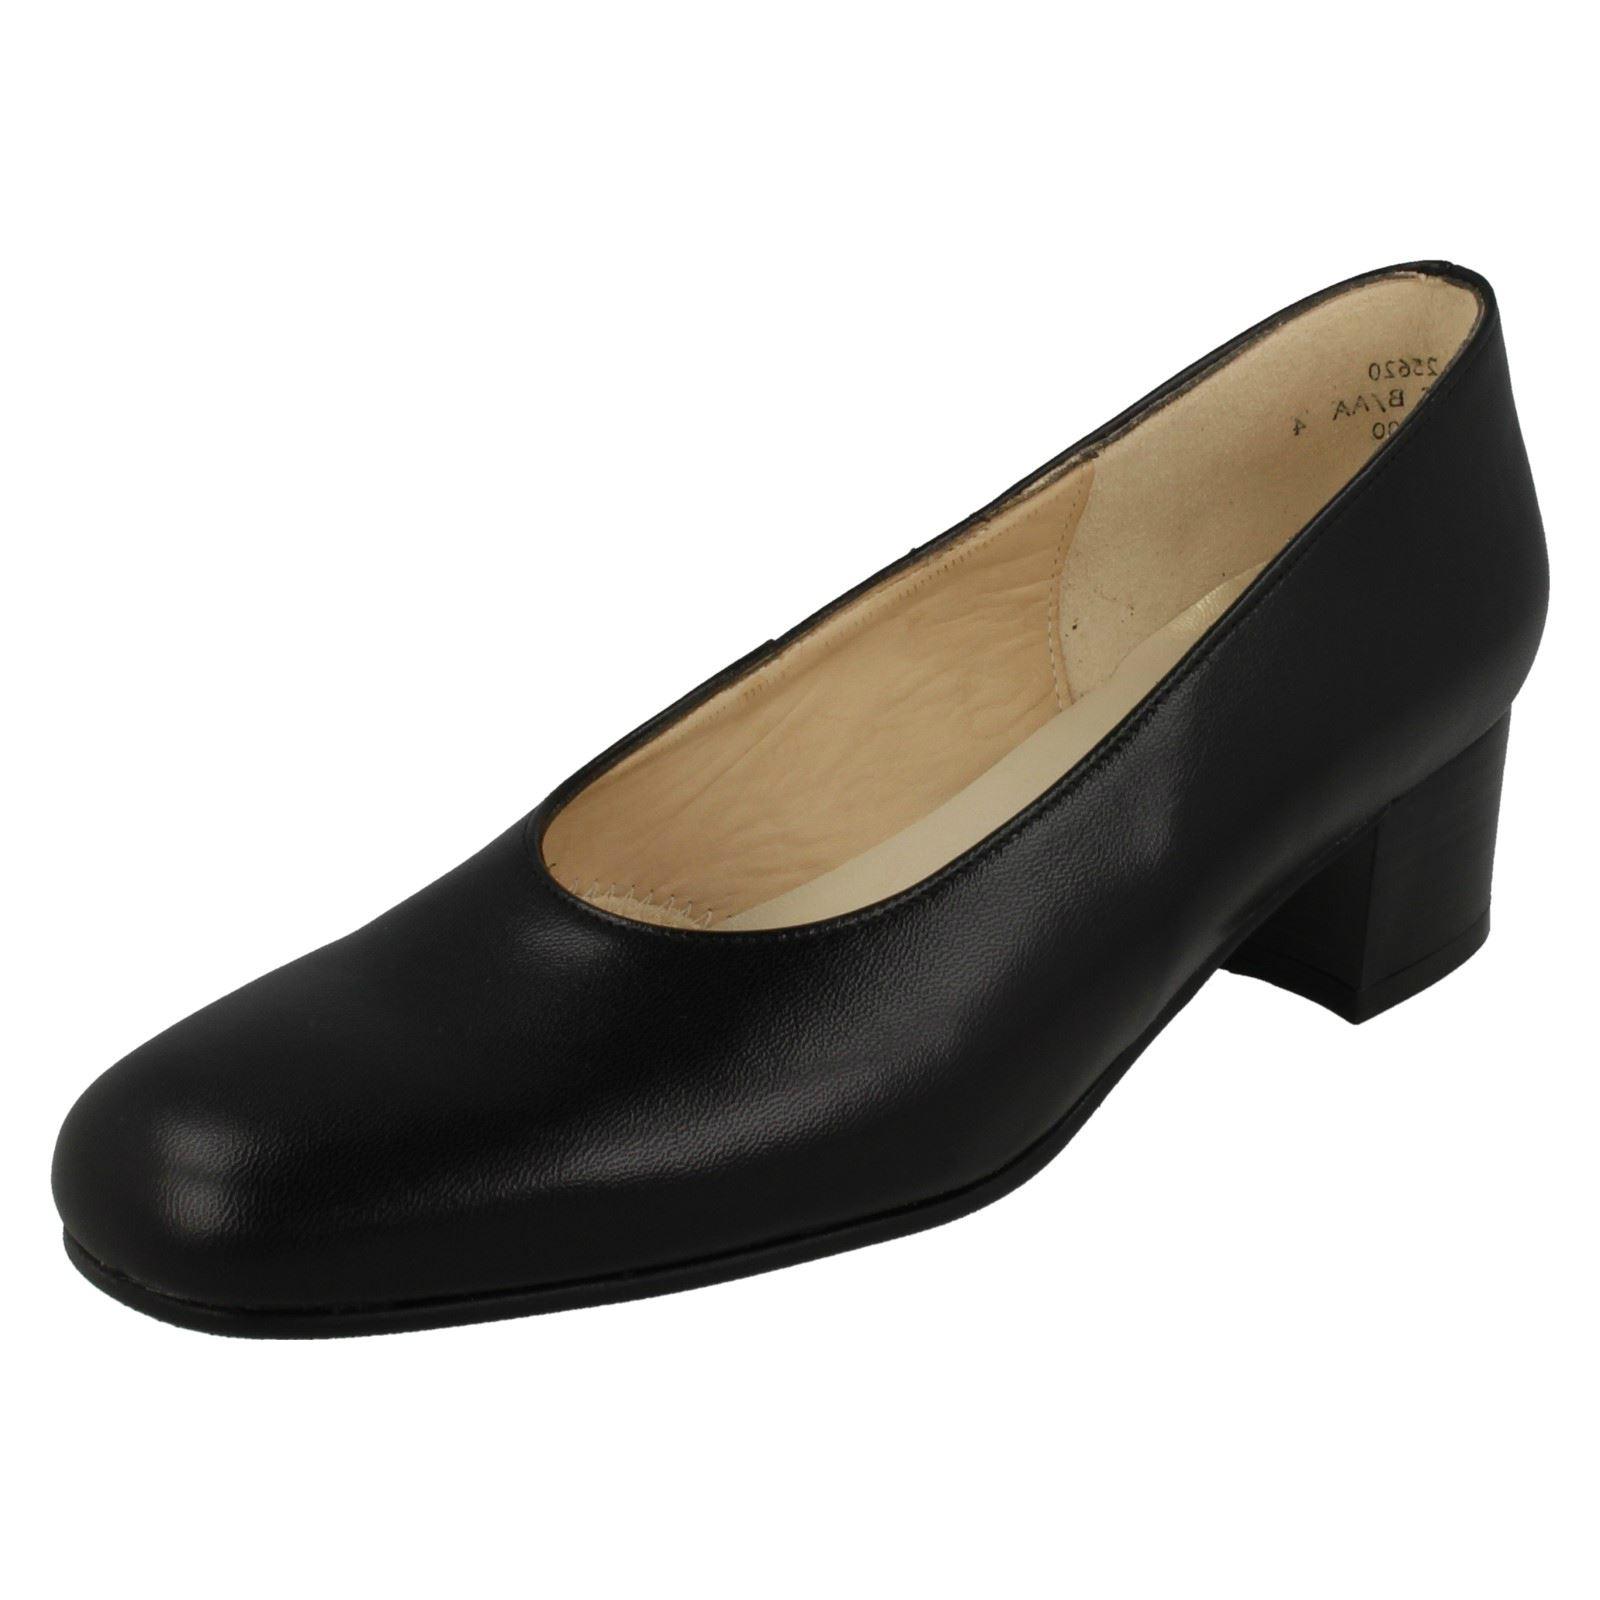 nil simile narrow fitting court shoes ebay